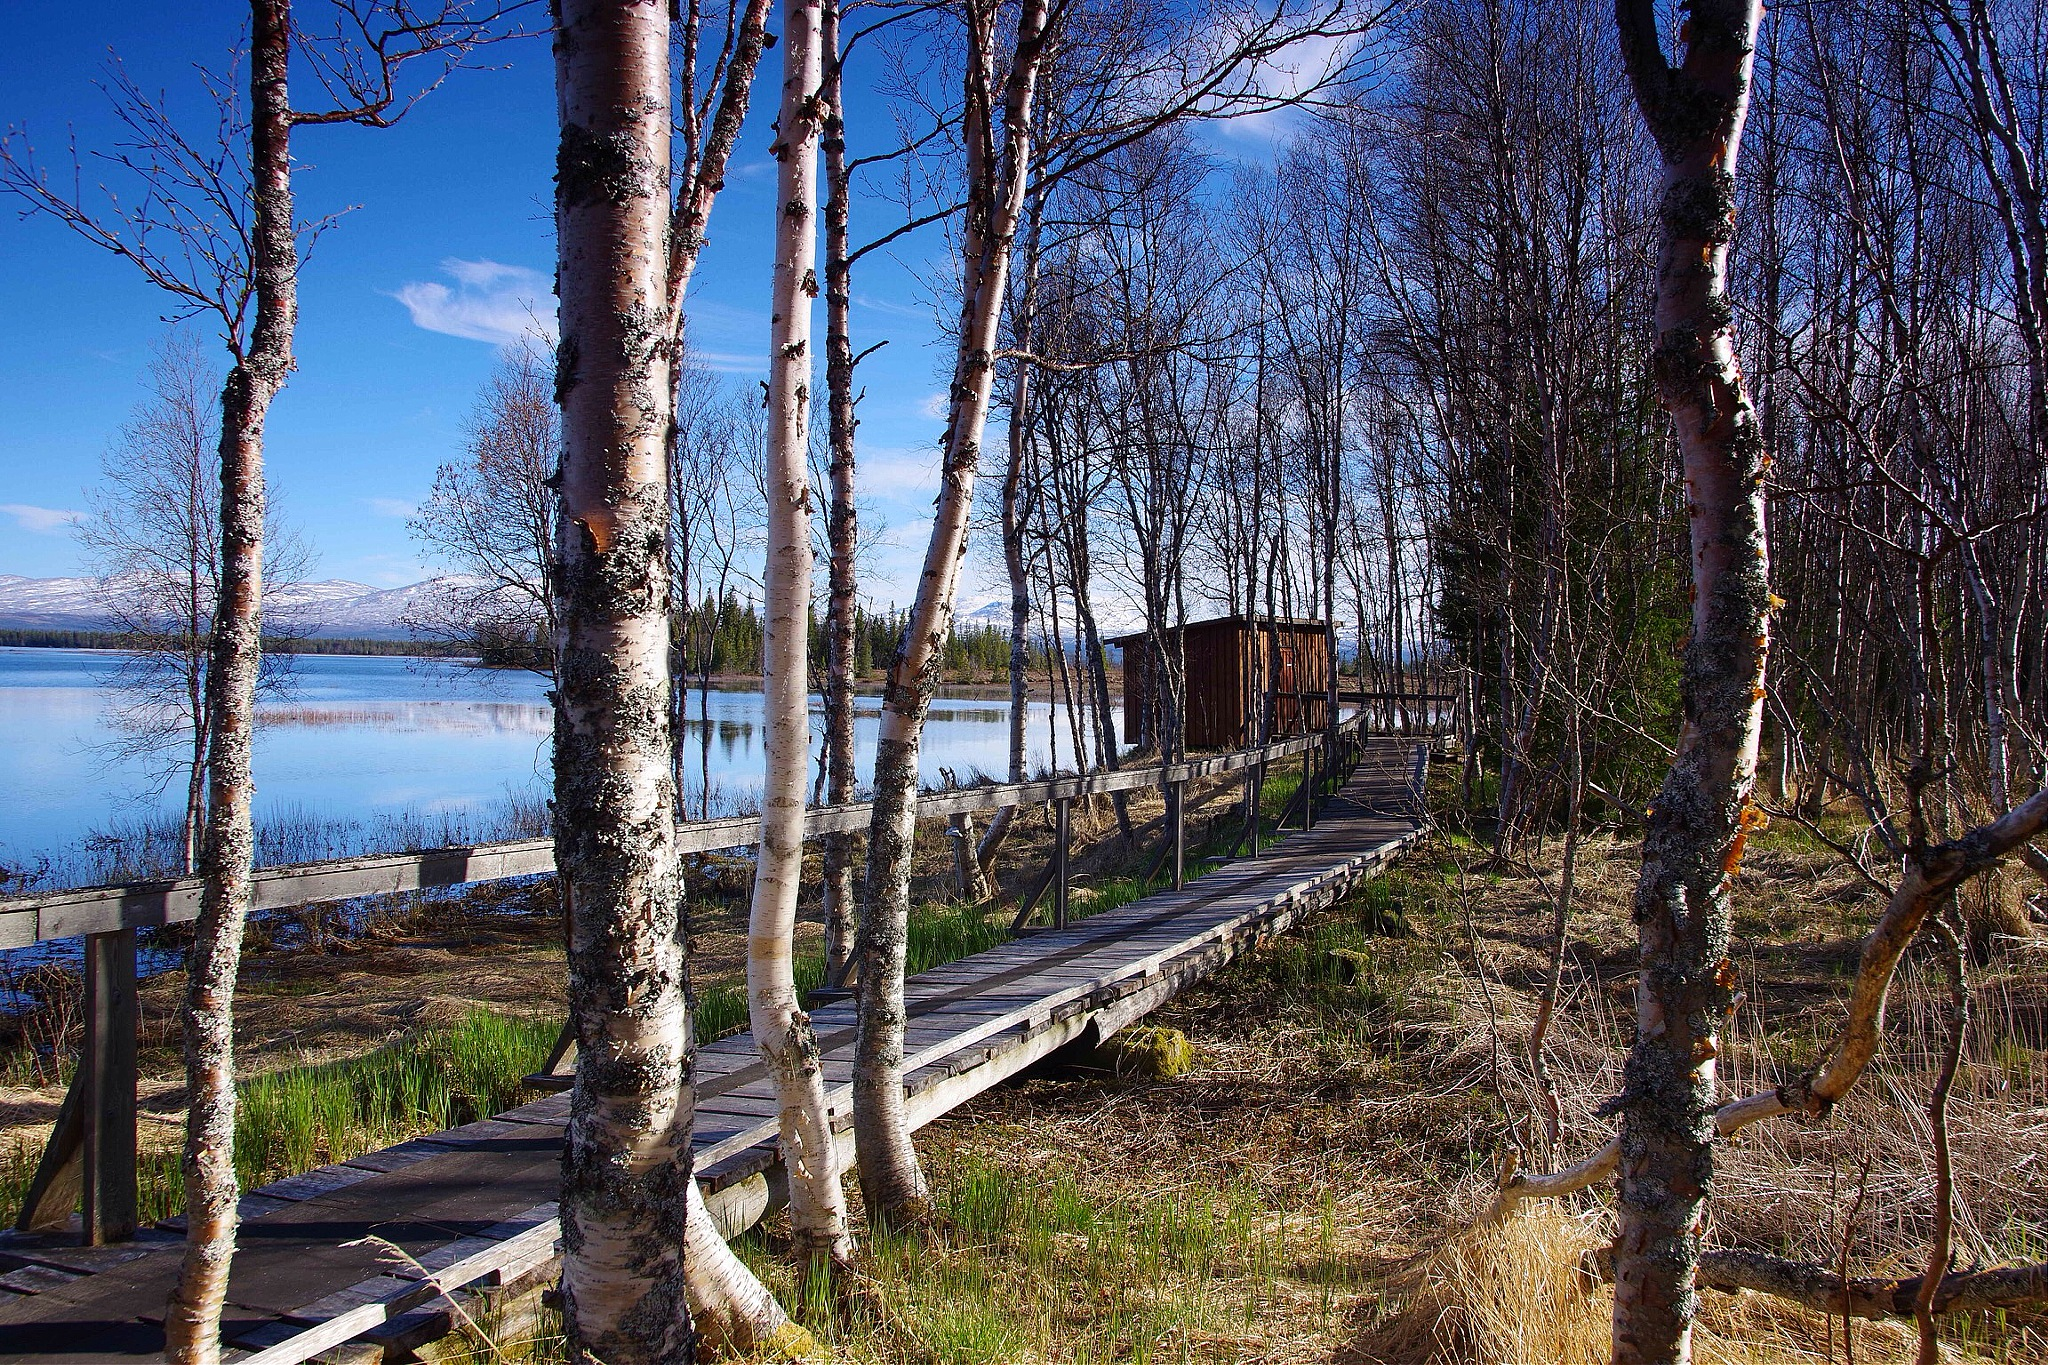 Lake Ånnsjön, Sweden by lundhanders